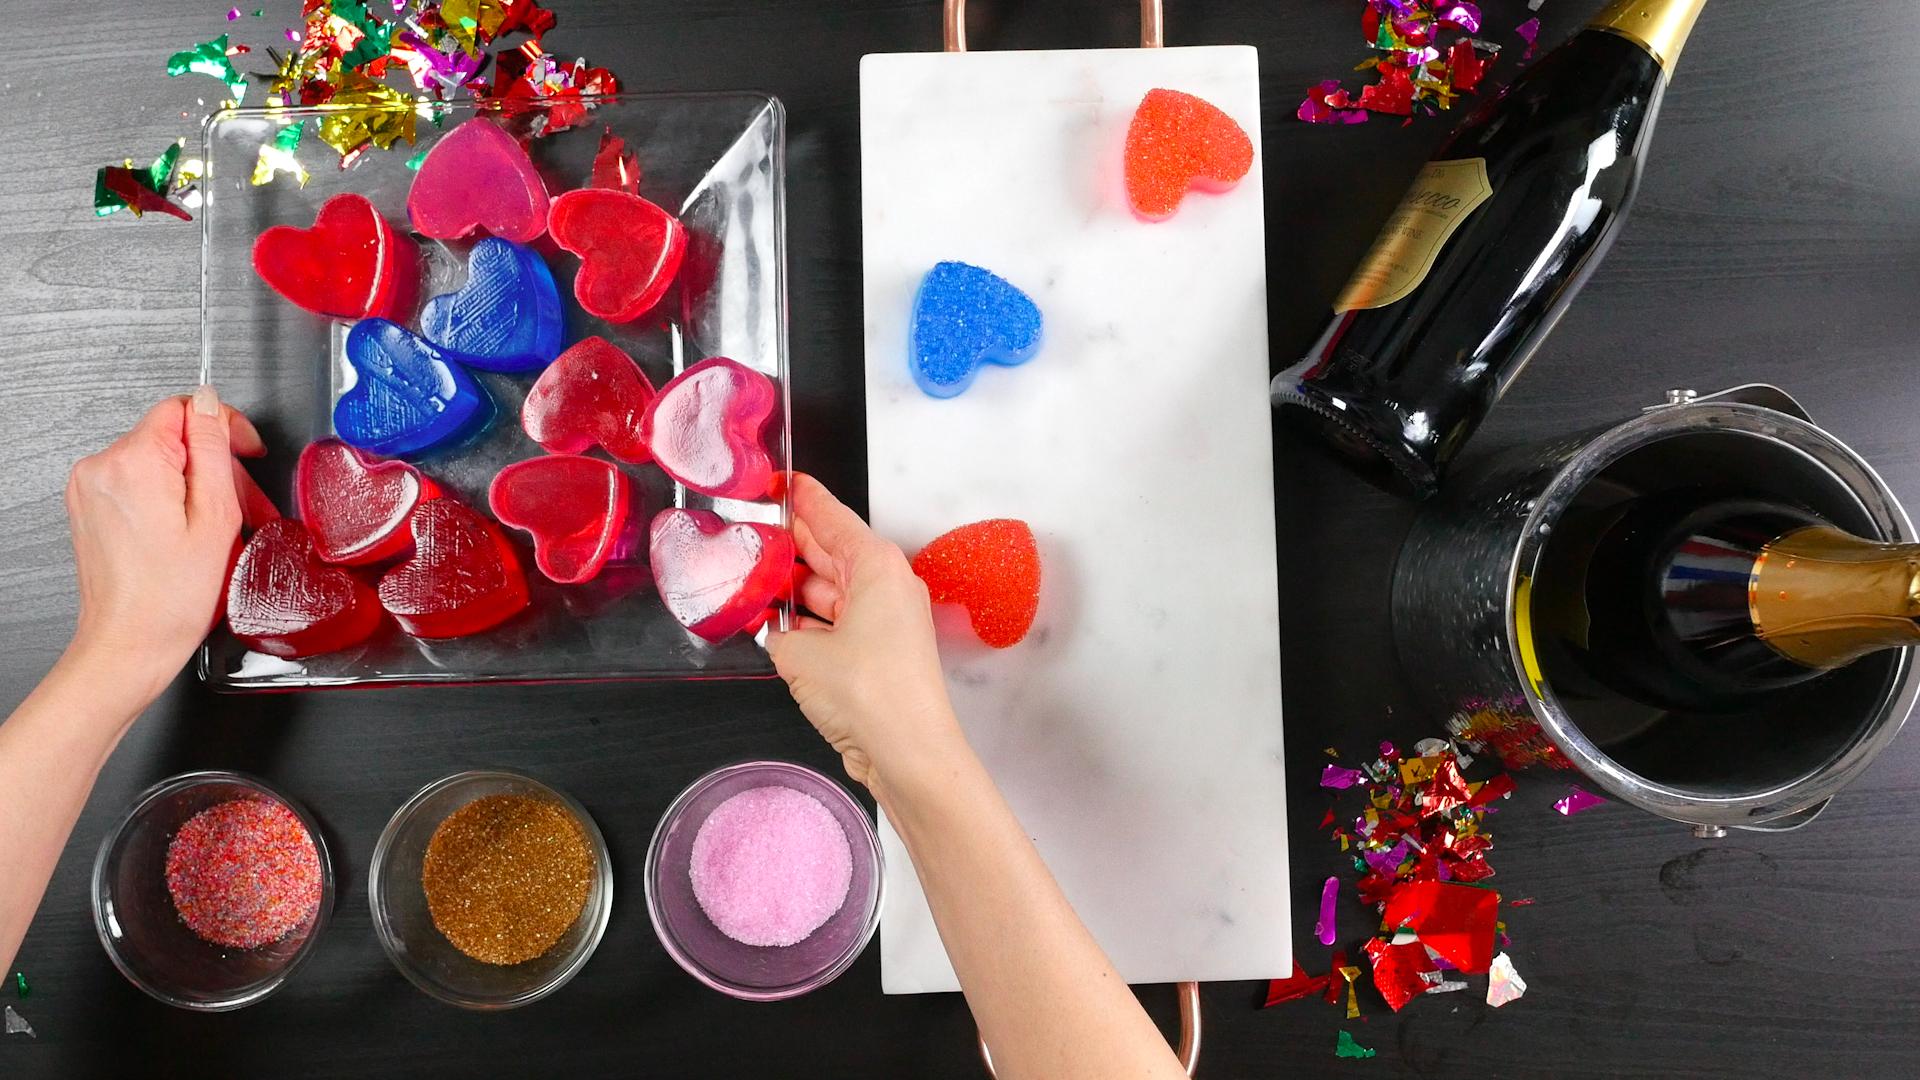 Red, white, and blue jello shots